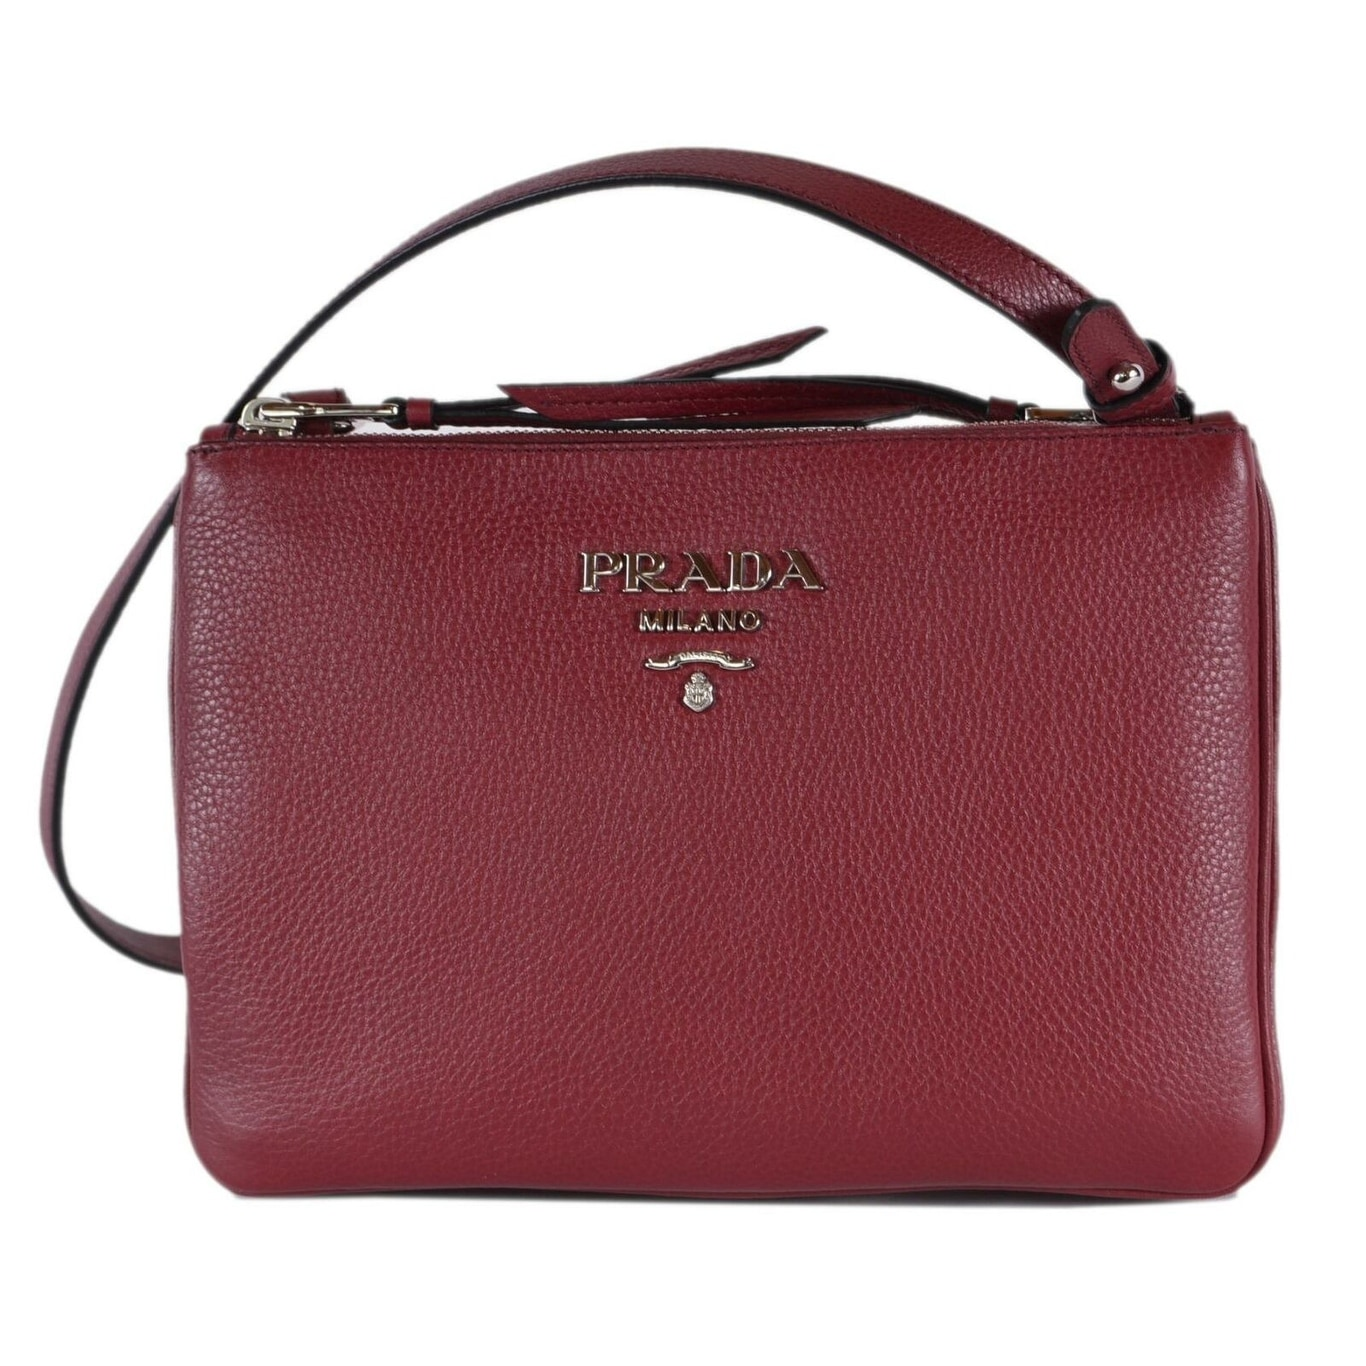 59ecfea8b8b6d9 Prada 1BH046 Cerise Vitello Leather Bandoliera Double Zip Crossbody Bag -  Red